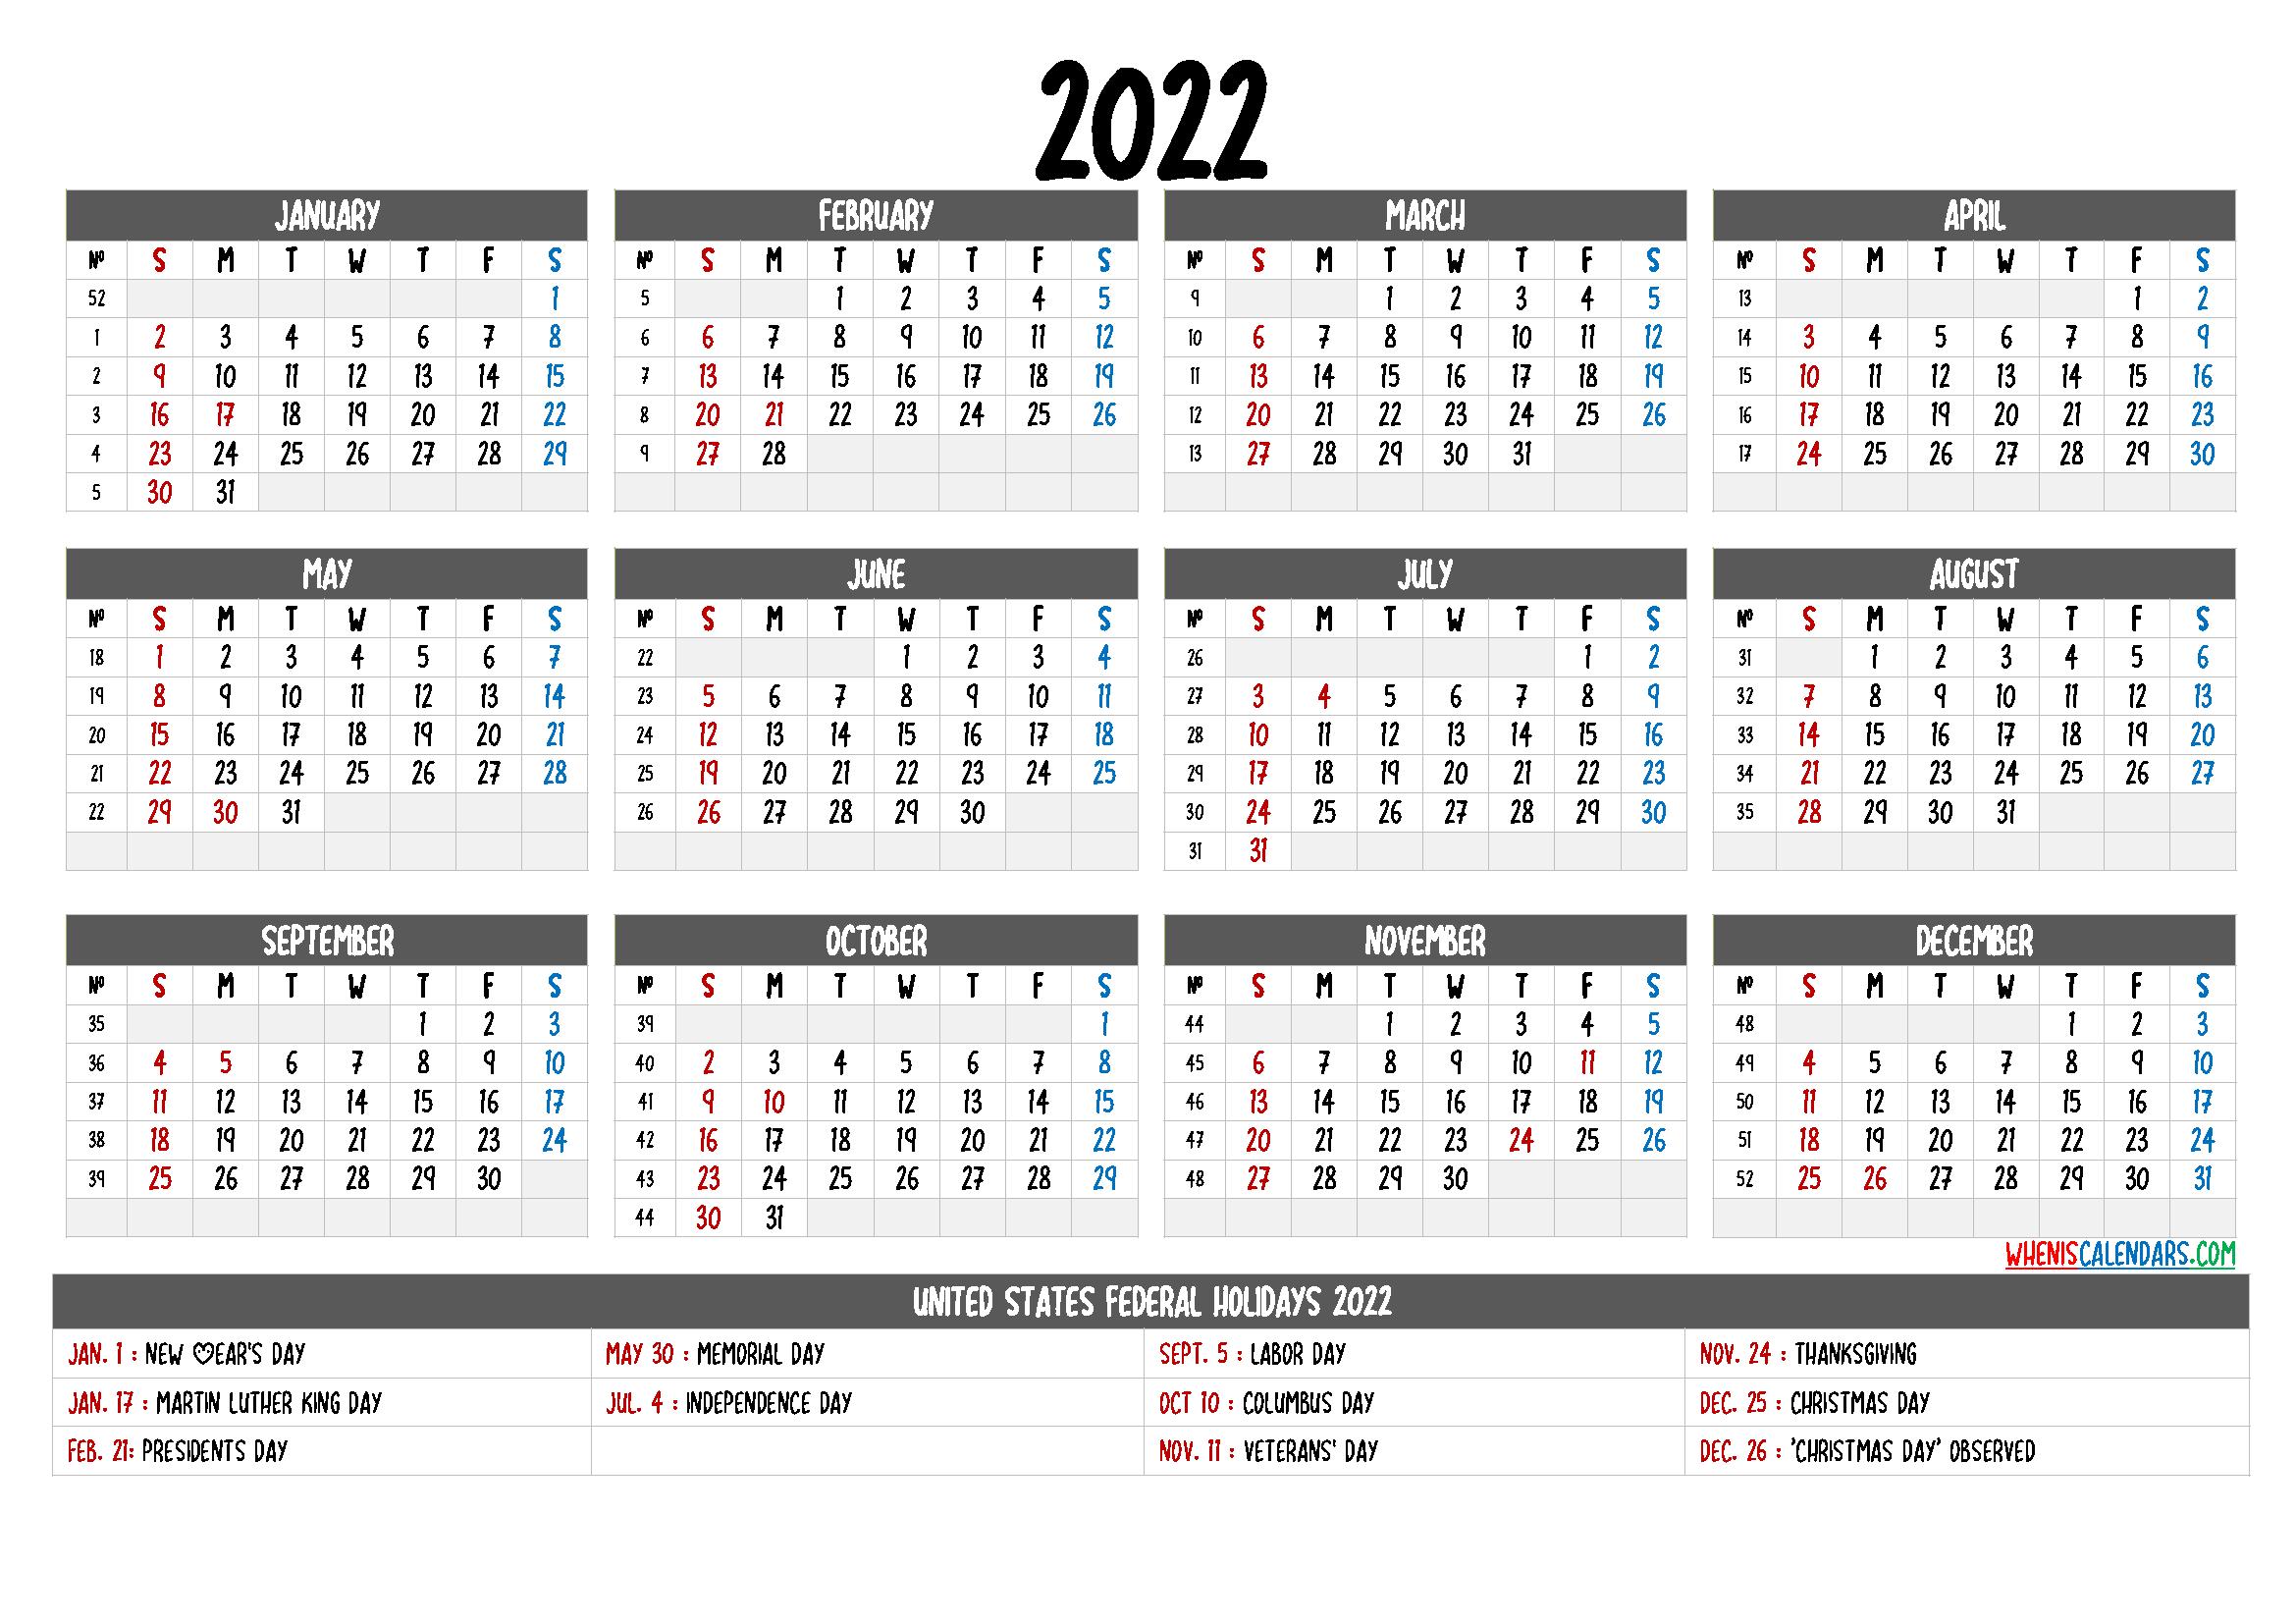 Free Printable Blank Calendar 2022.Free Printable Yearly Calendar 2022 6 Templates Yearly Calendar Template Printable Yearly Calendar Calendar Printables